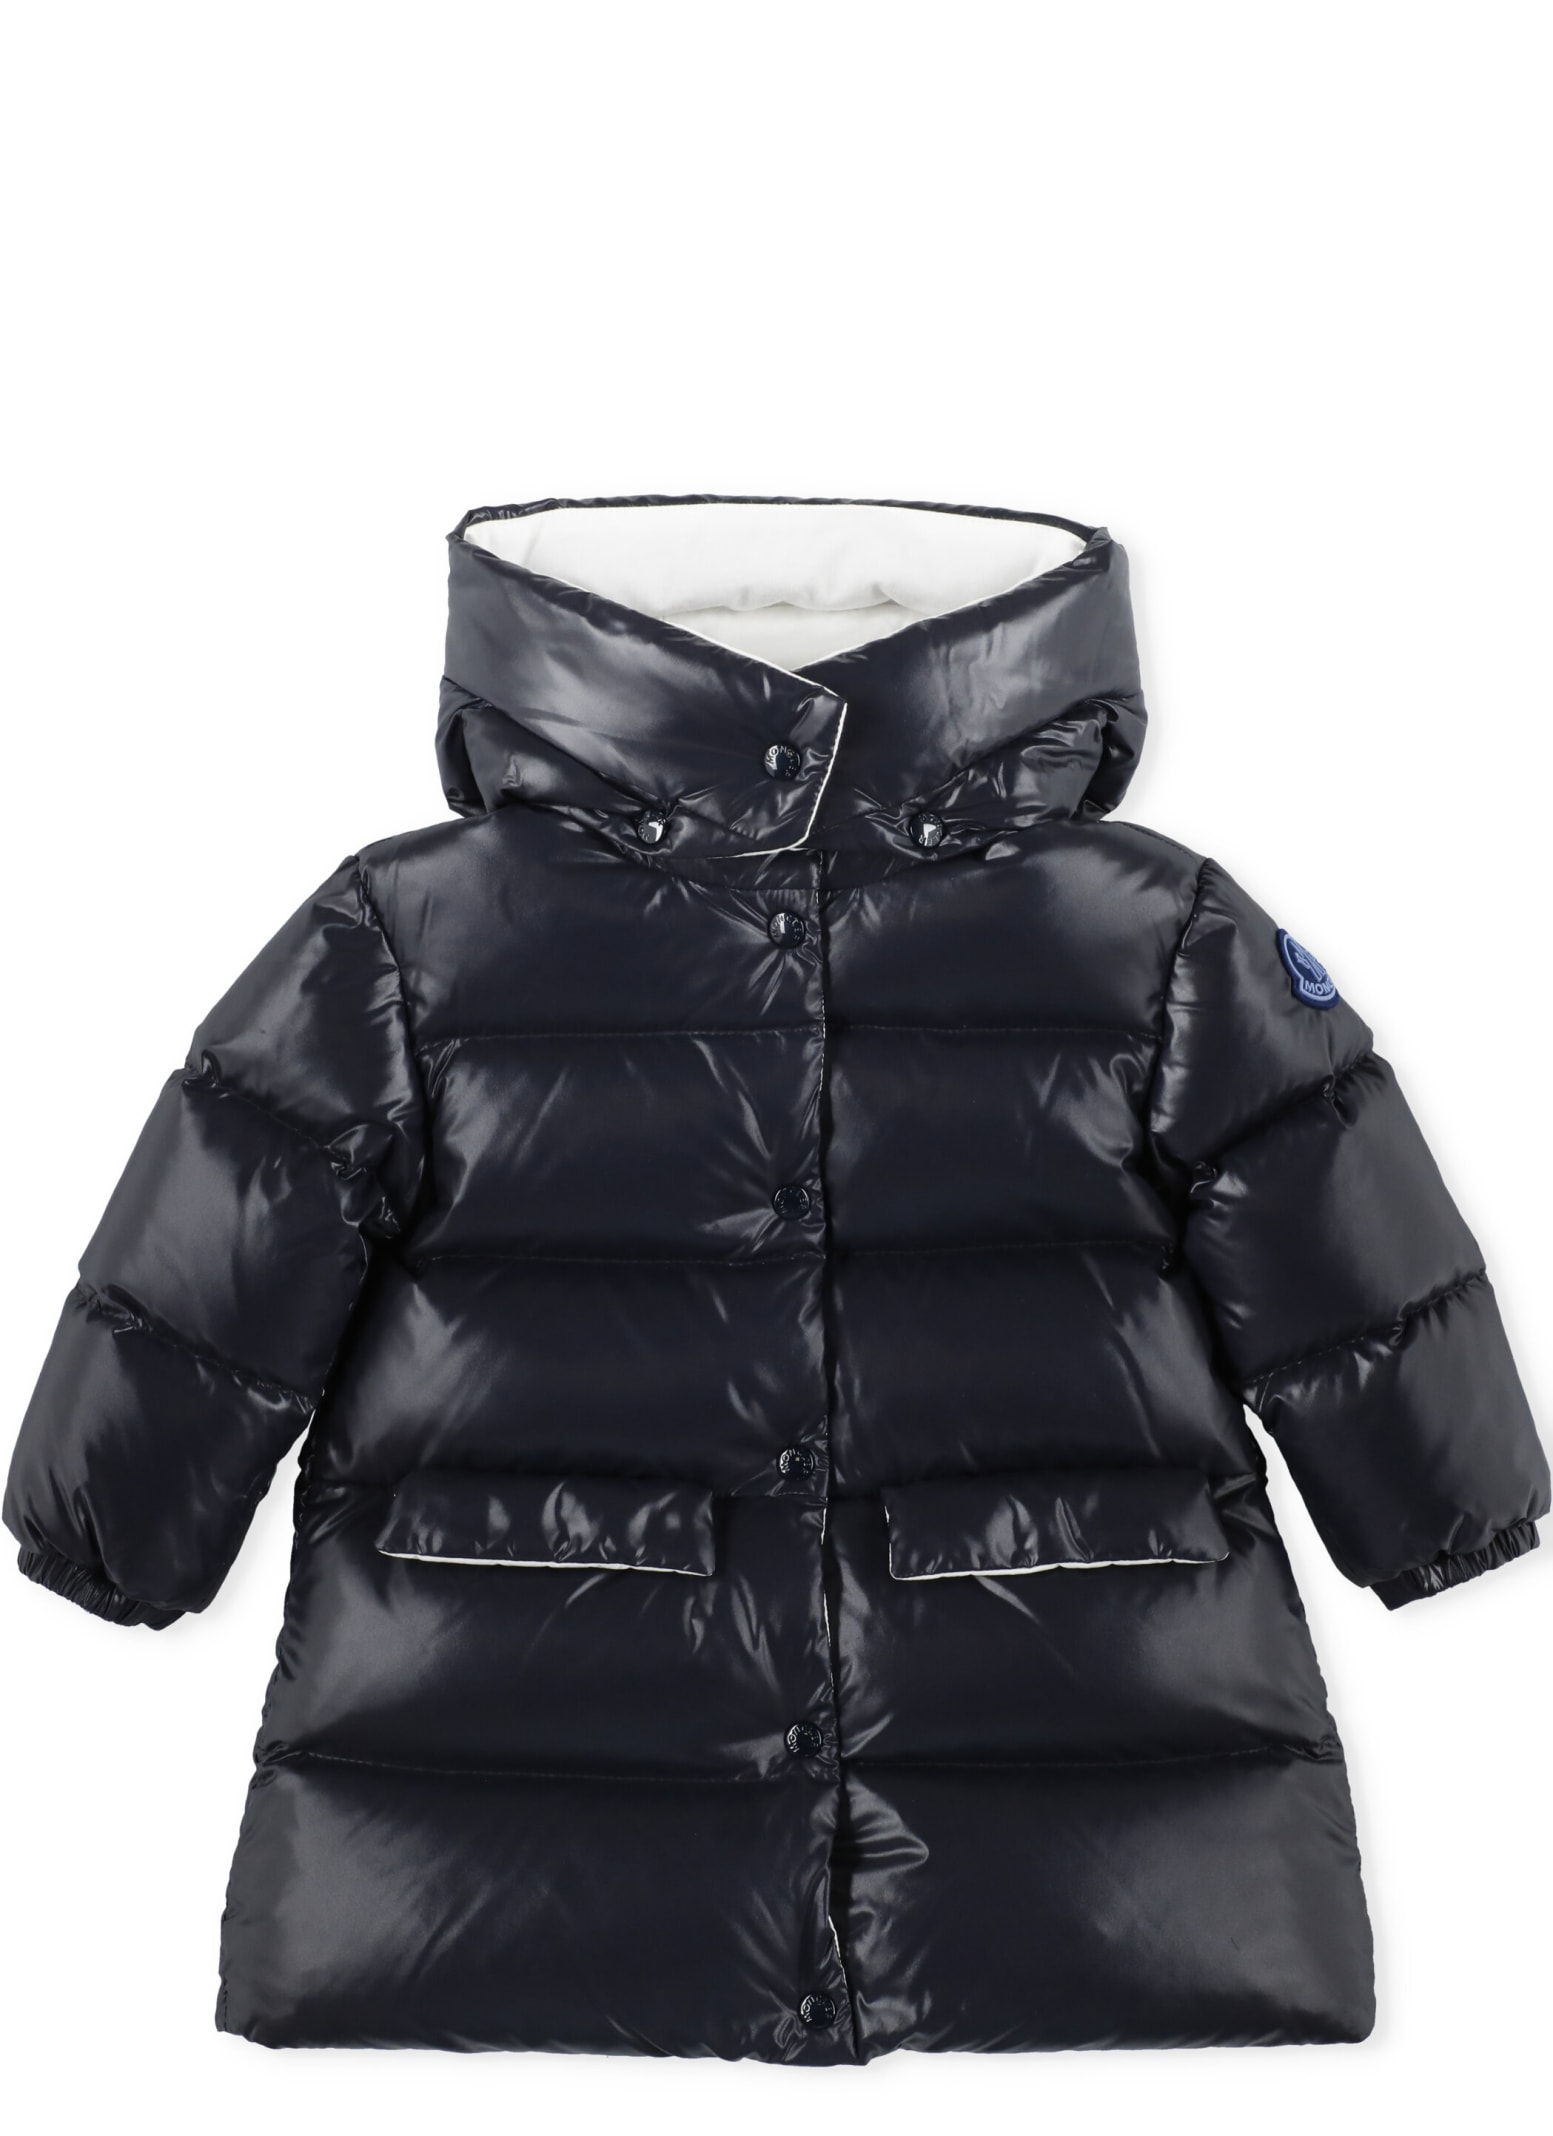 Moncler Suna Down Jacket